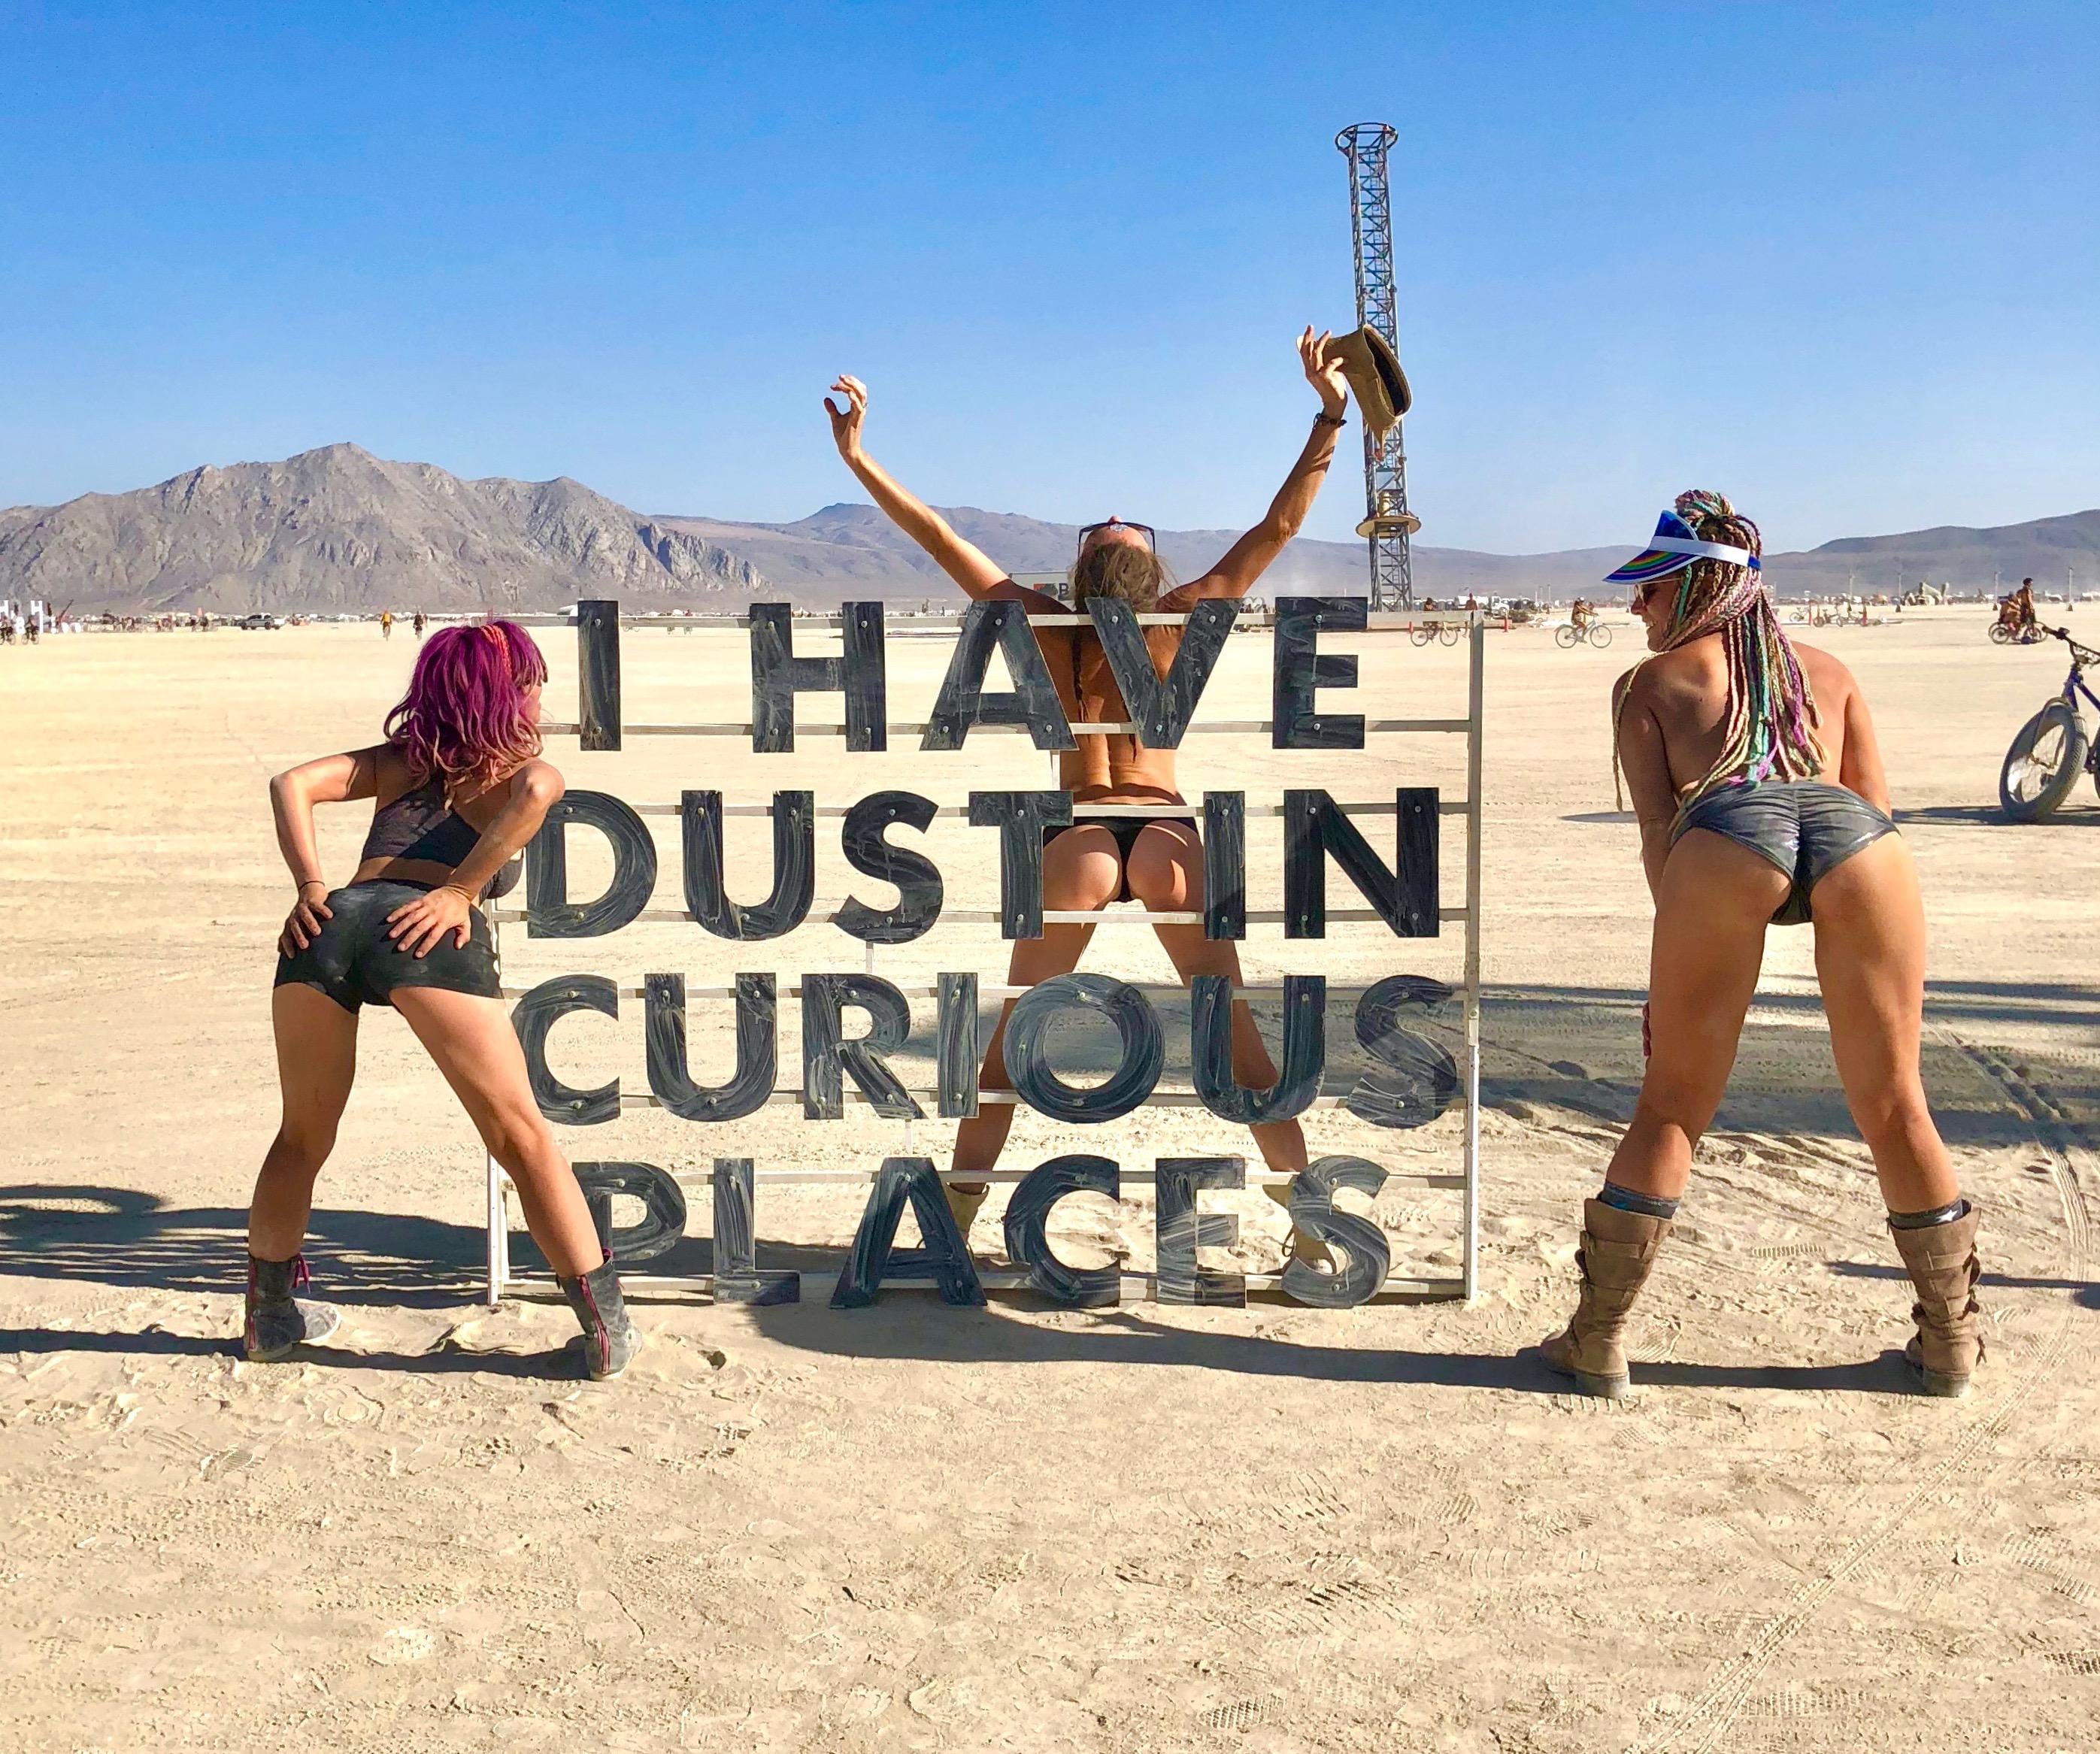 Naked girls in vans What Happens At Burning Man Camper Van Life Solo Female Travel